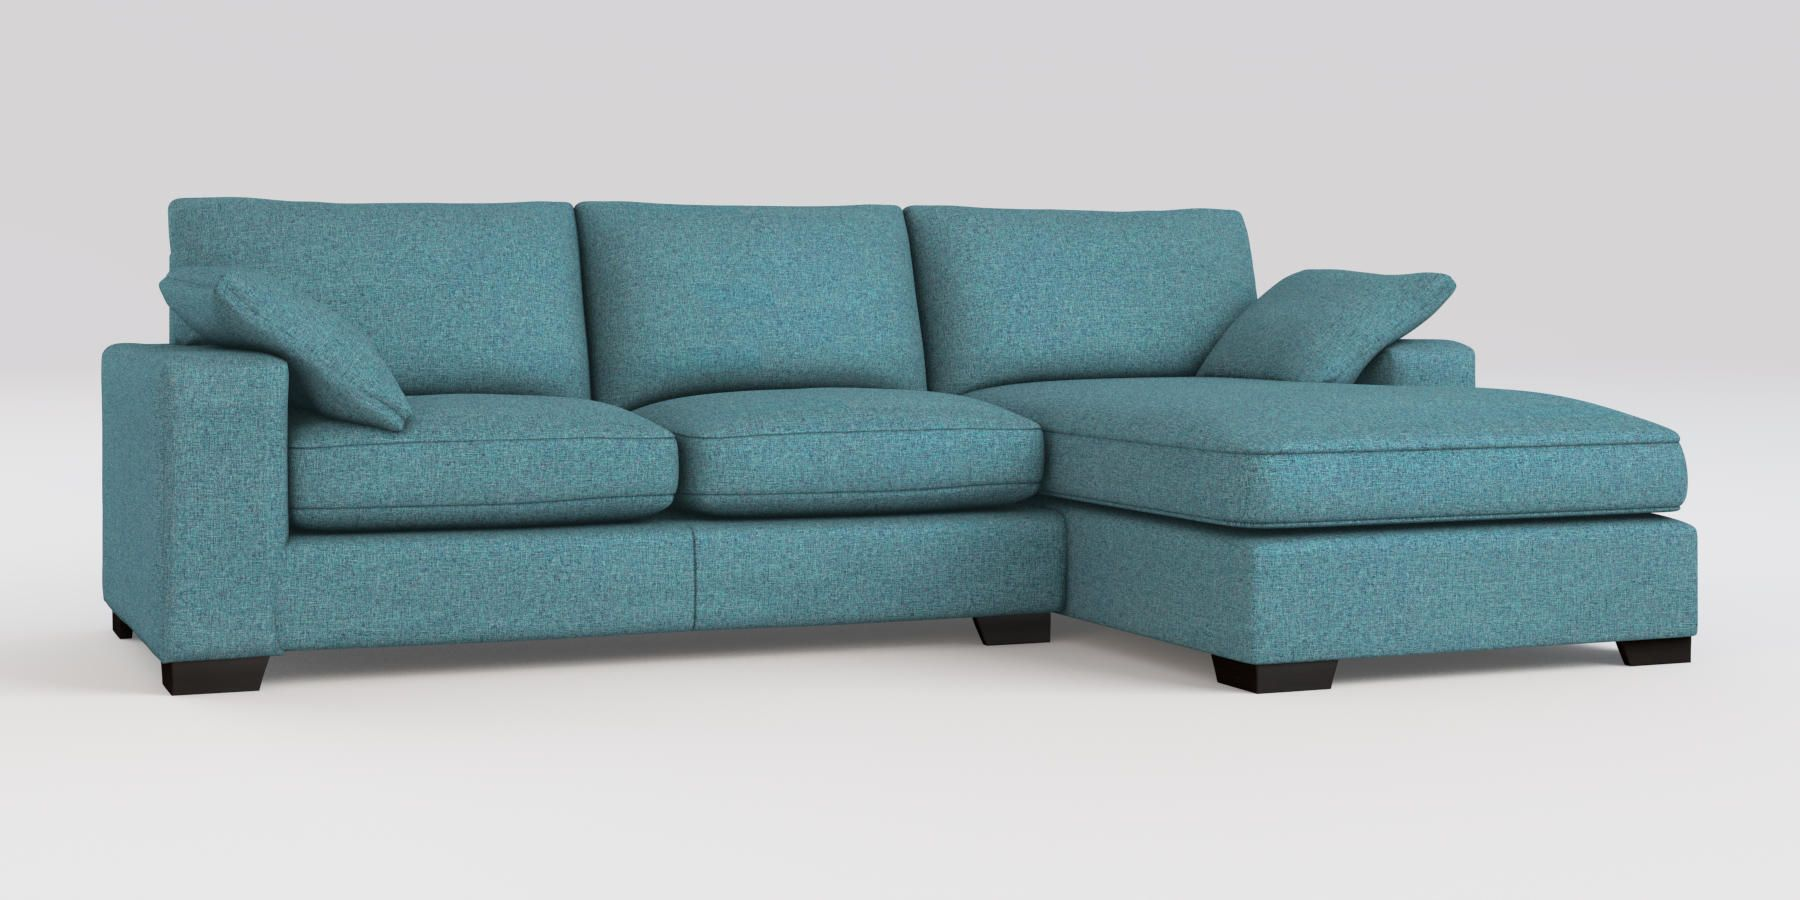 Buy Sonoma II Corner Chaise - Right Hand (4 seats) Tweedy Blend Teal ...